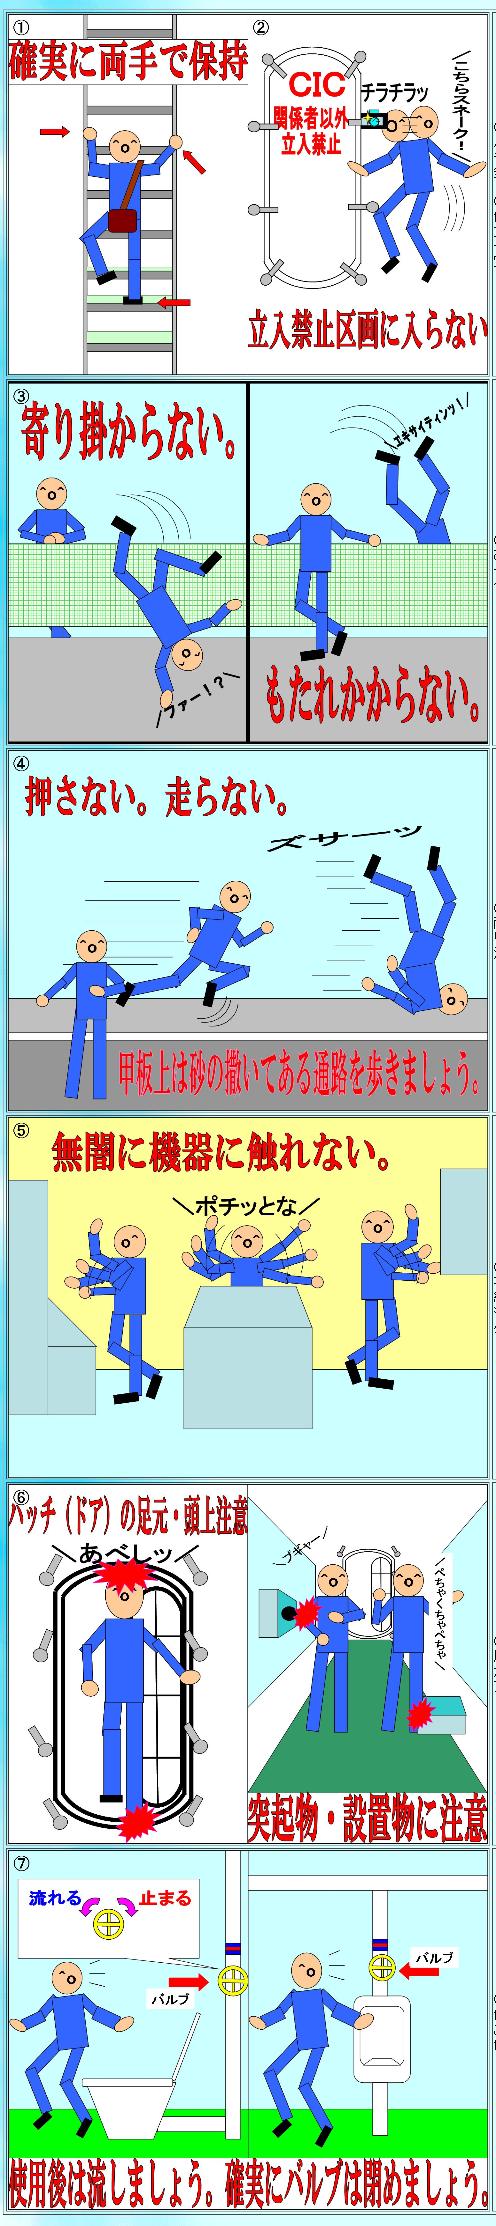 mod_go_jp_pco_miyagi_kaiji_kaiji39